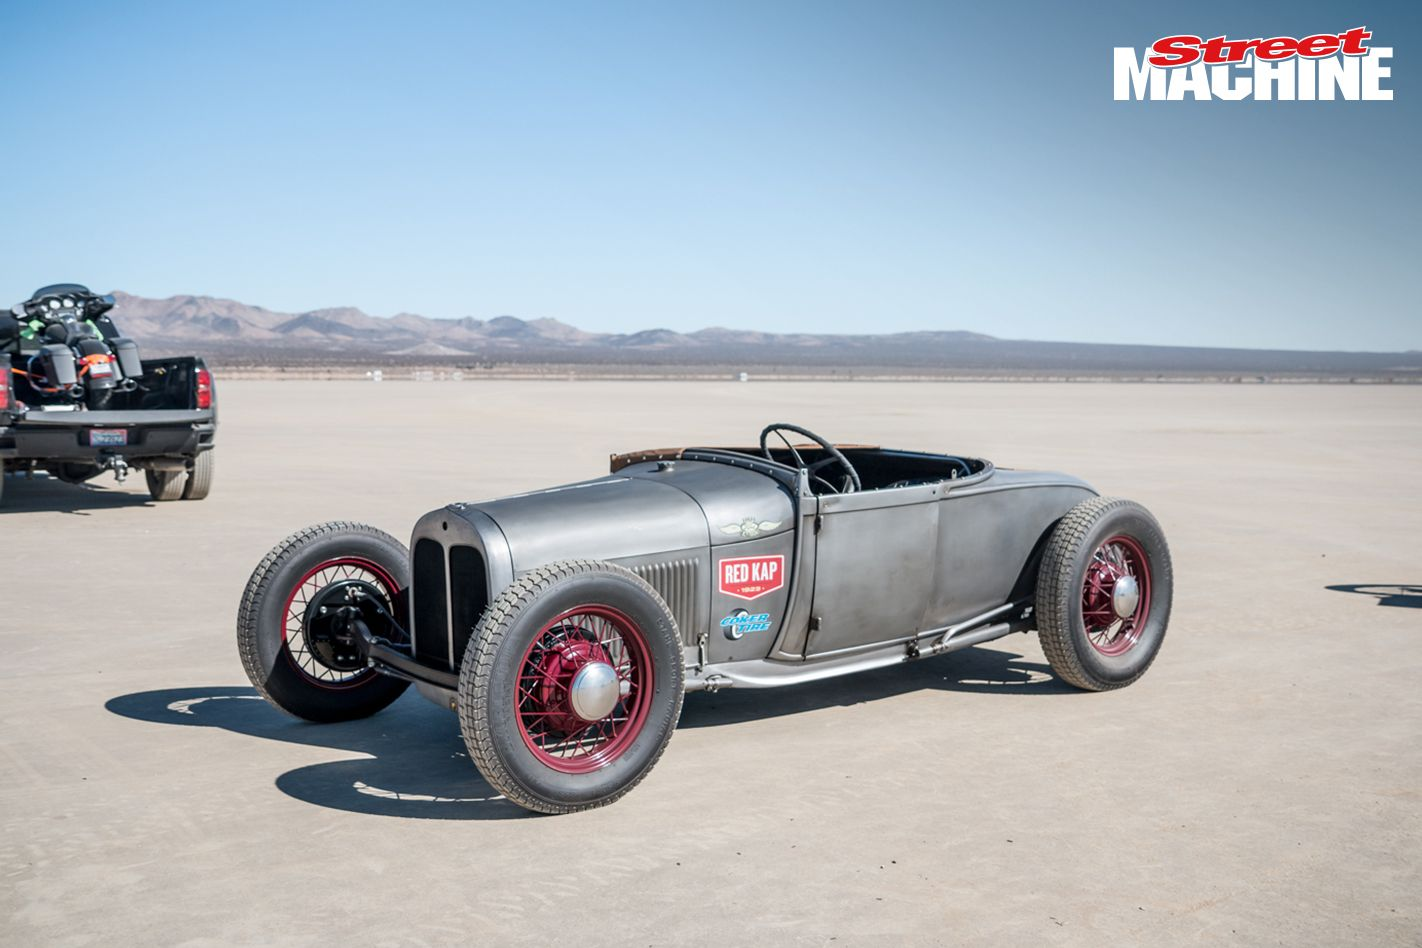 El-mirage-Land-Speed-Racing-3914.jpg (JPEG-bild, 1422×948 pixlar) - Skalad (84%)